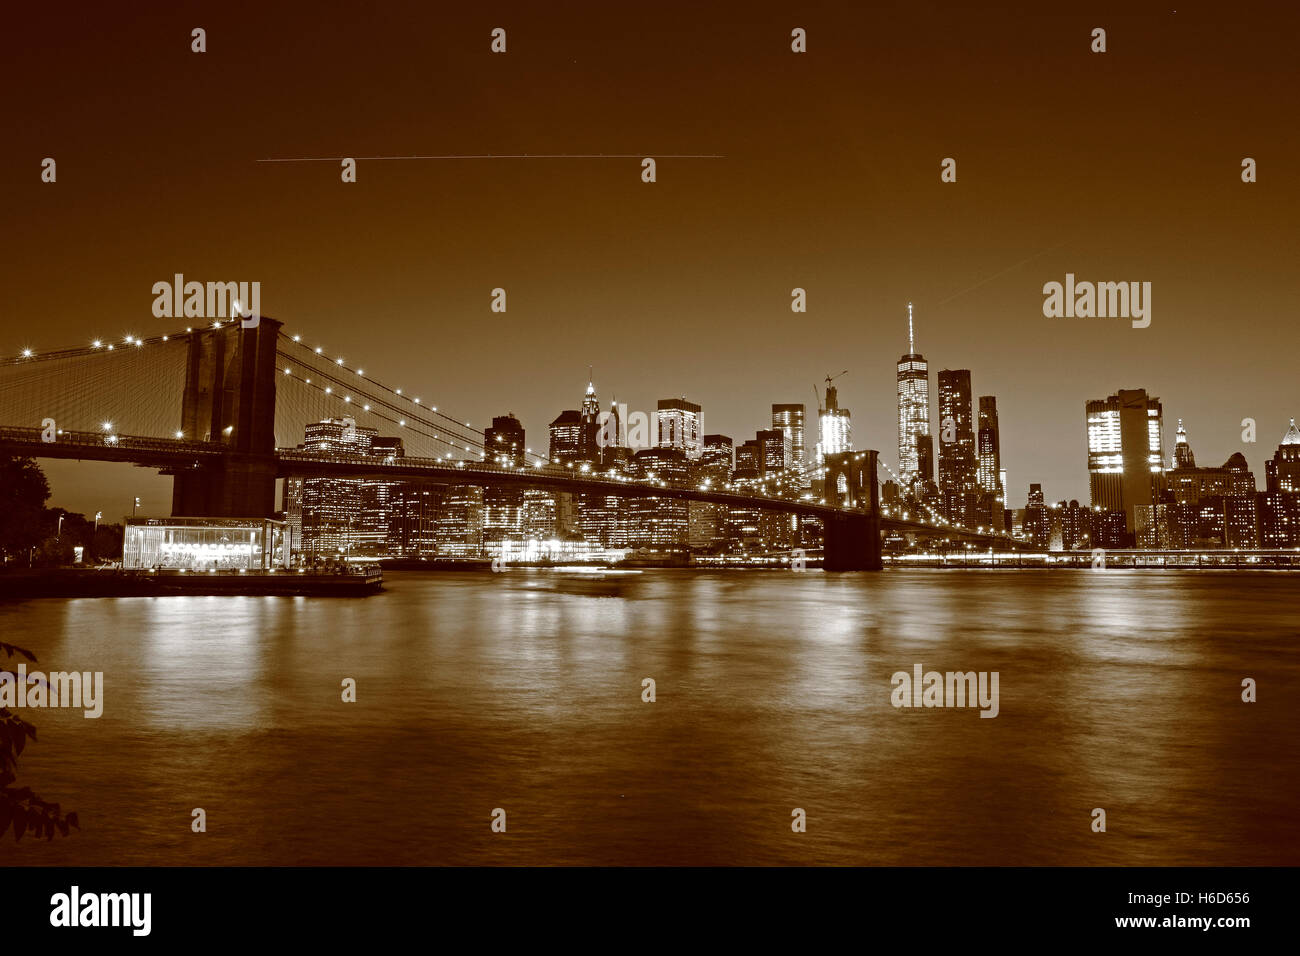 Sepia tones black & white evening view of Brooklyn Bridge from Main Street Park, Dumbo, Brooklyn, NY, United States. Stock Photo